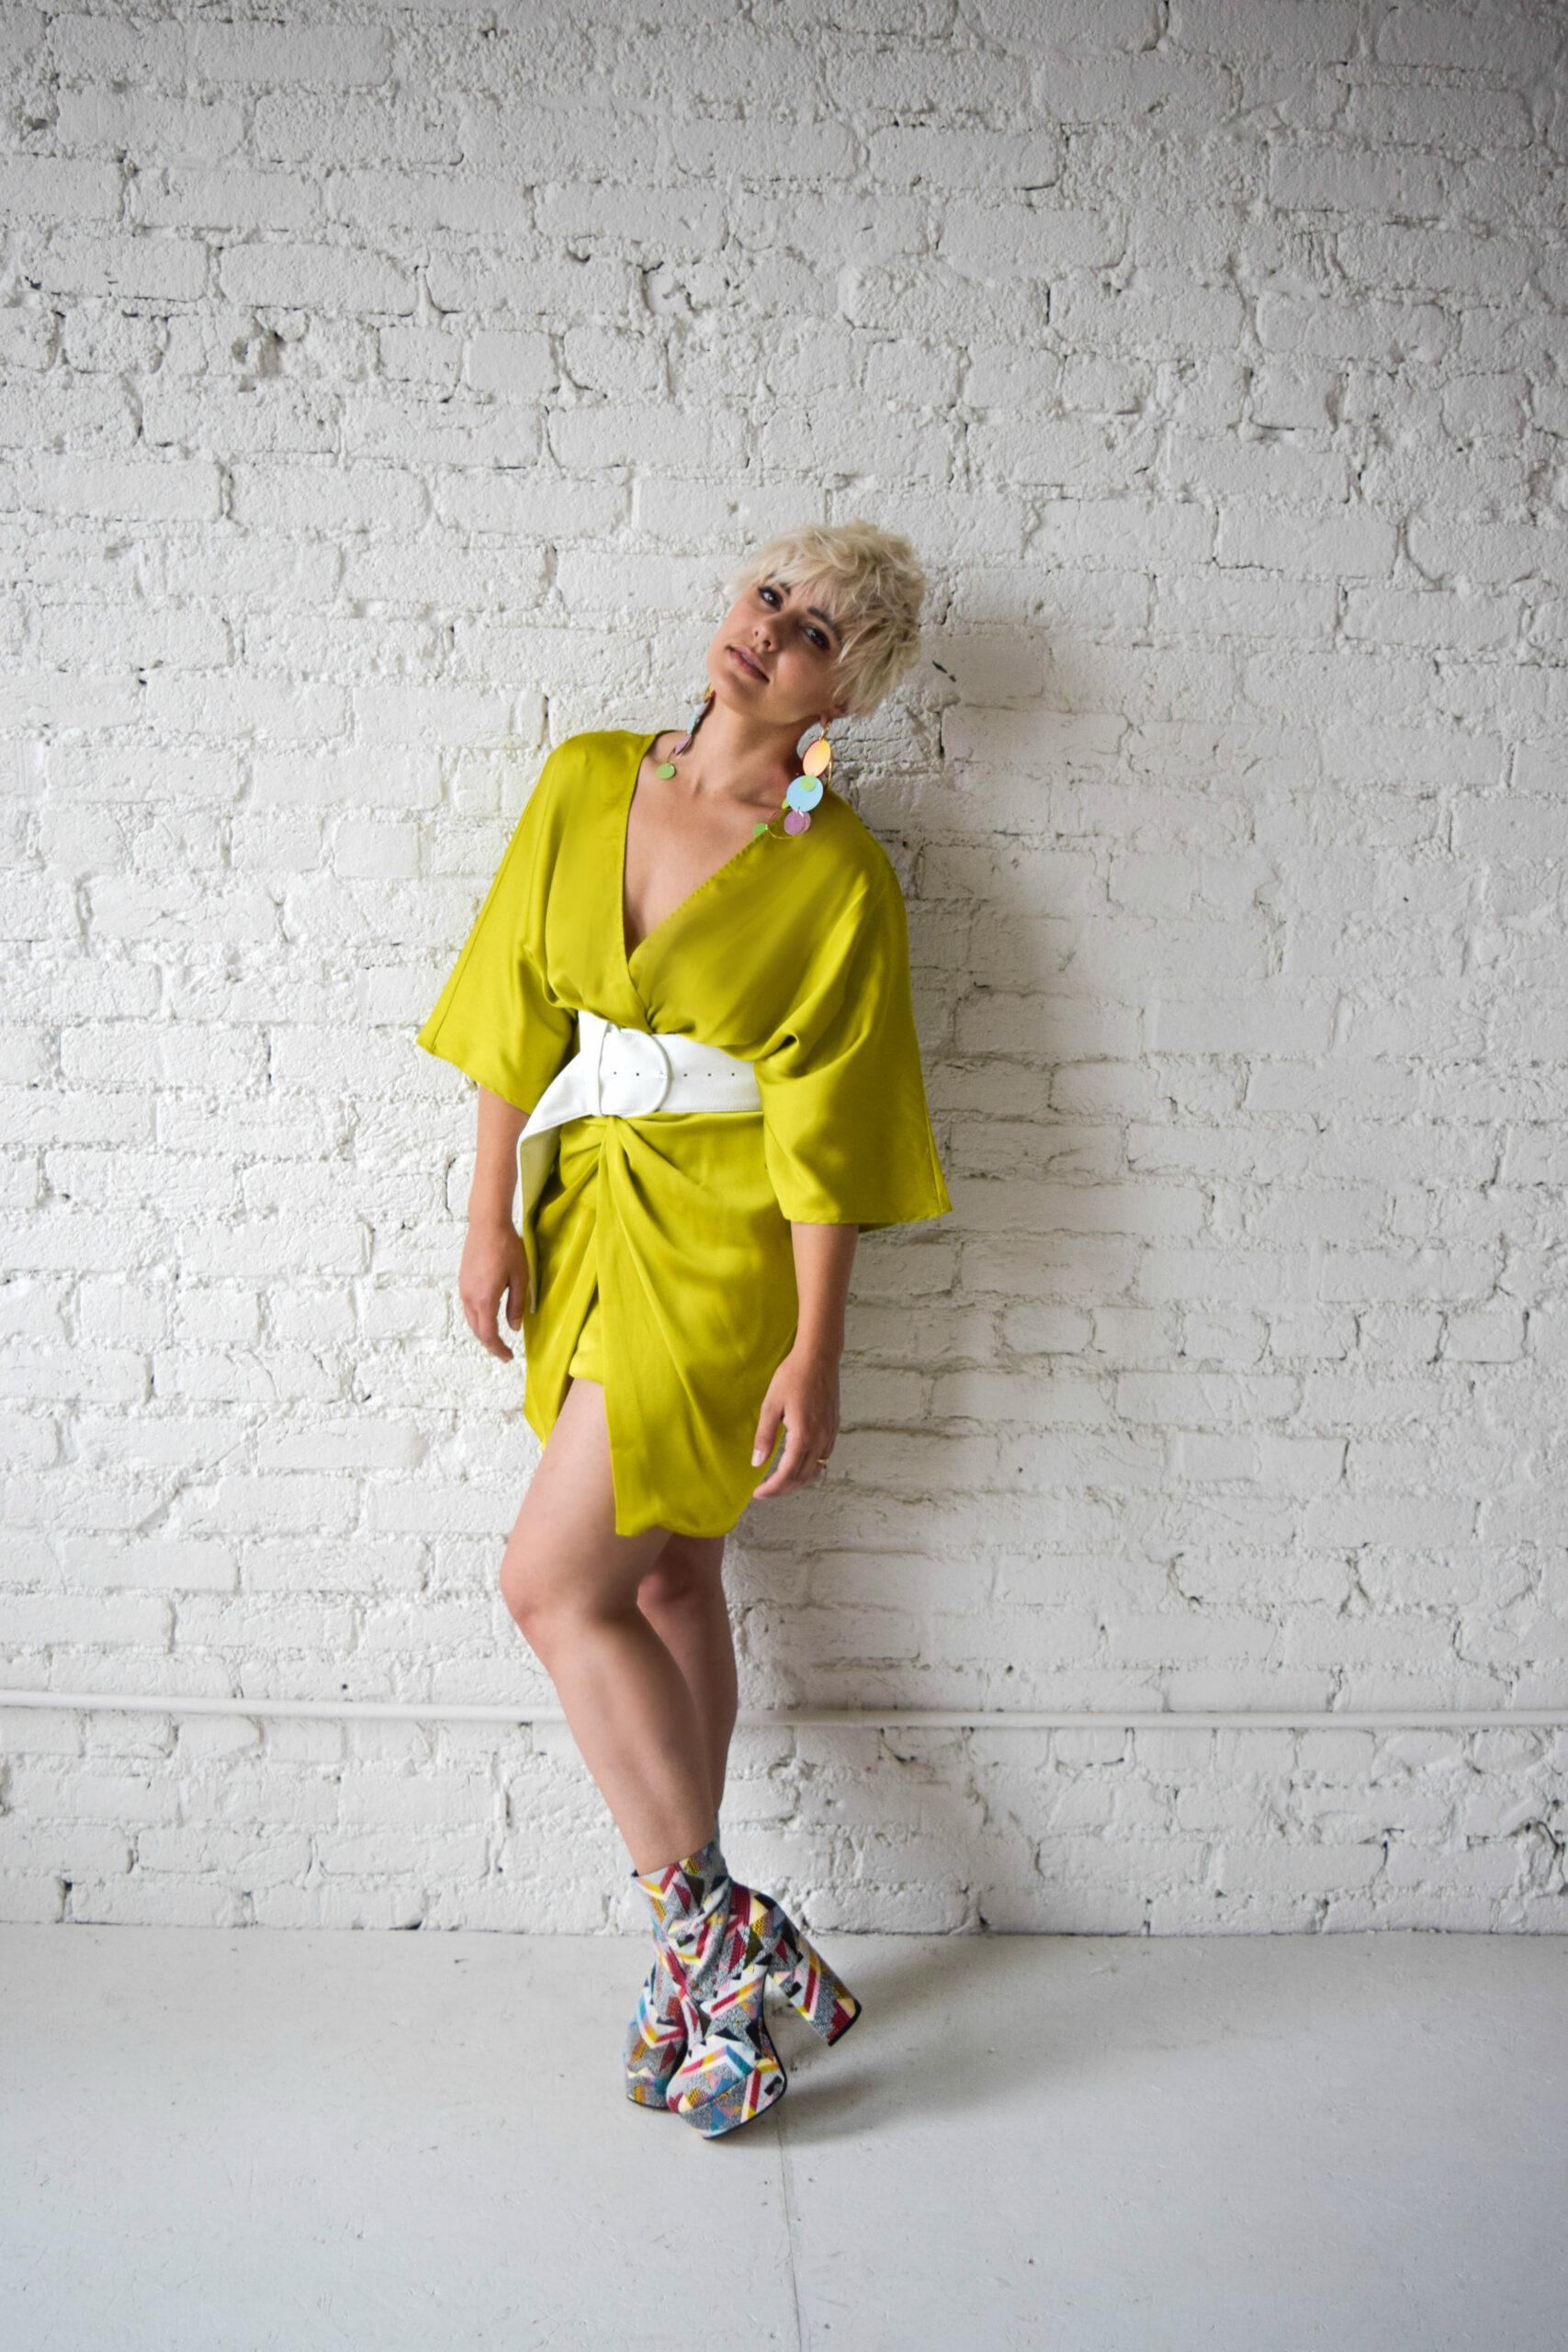 The Bombshell: Embracing Your 80's Alter-Ego Using Modern Clothing - BloggerNotBillionaire.com